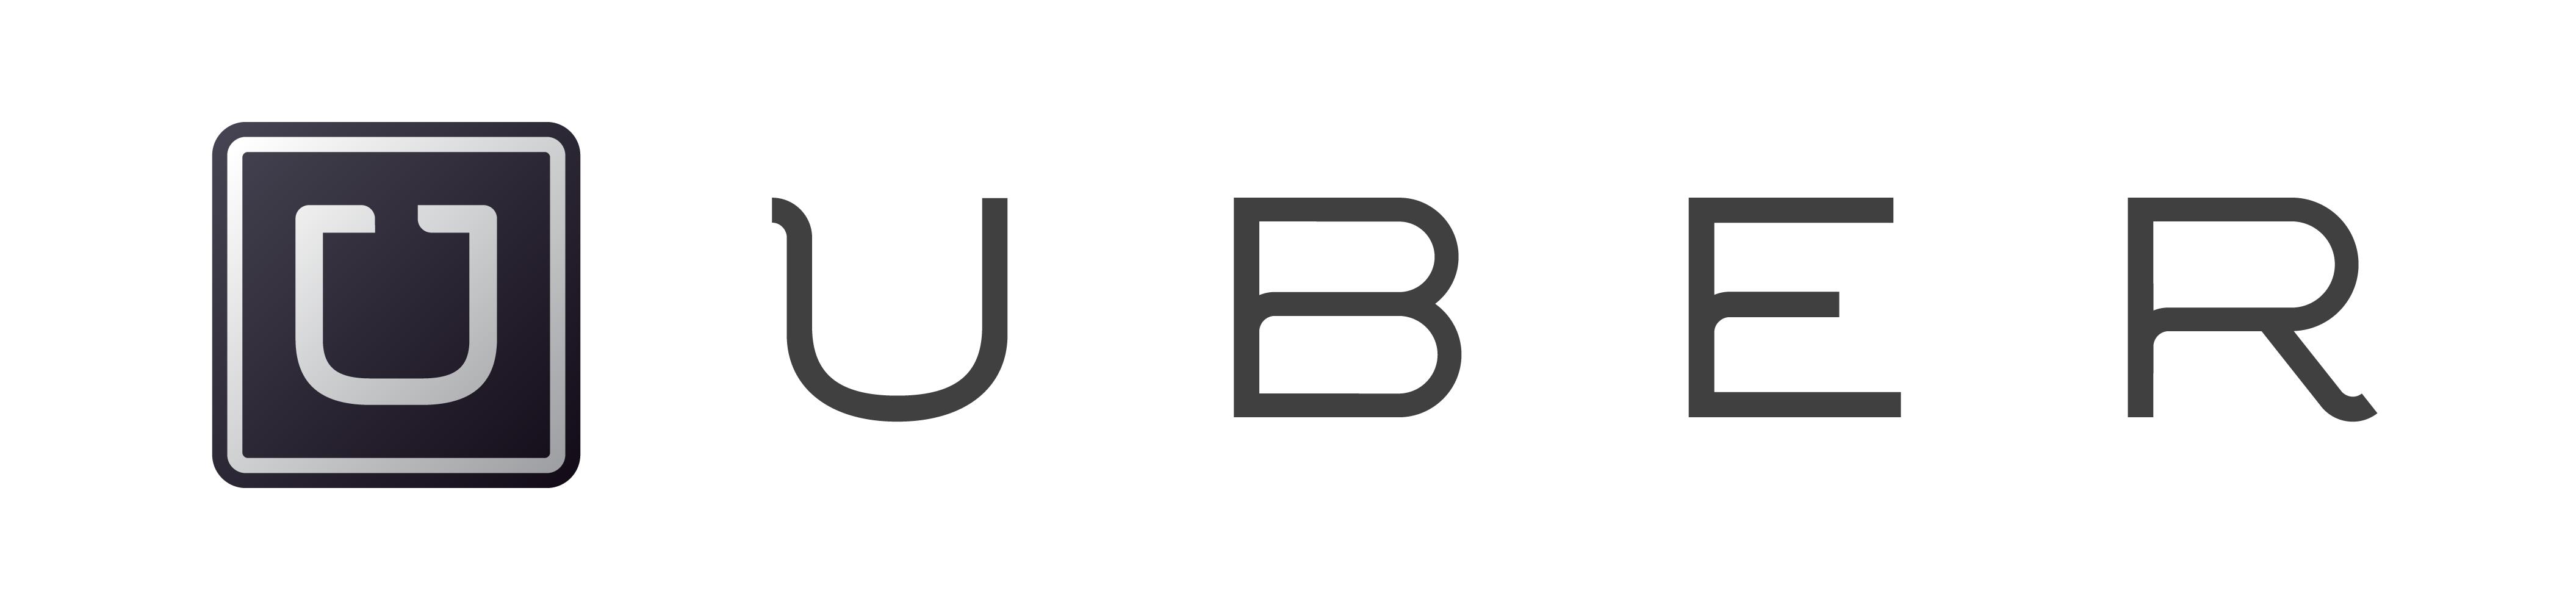 Uber Vector PNG - 108182